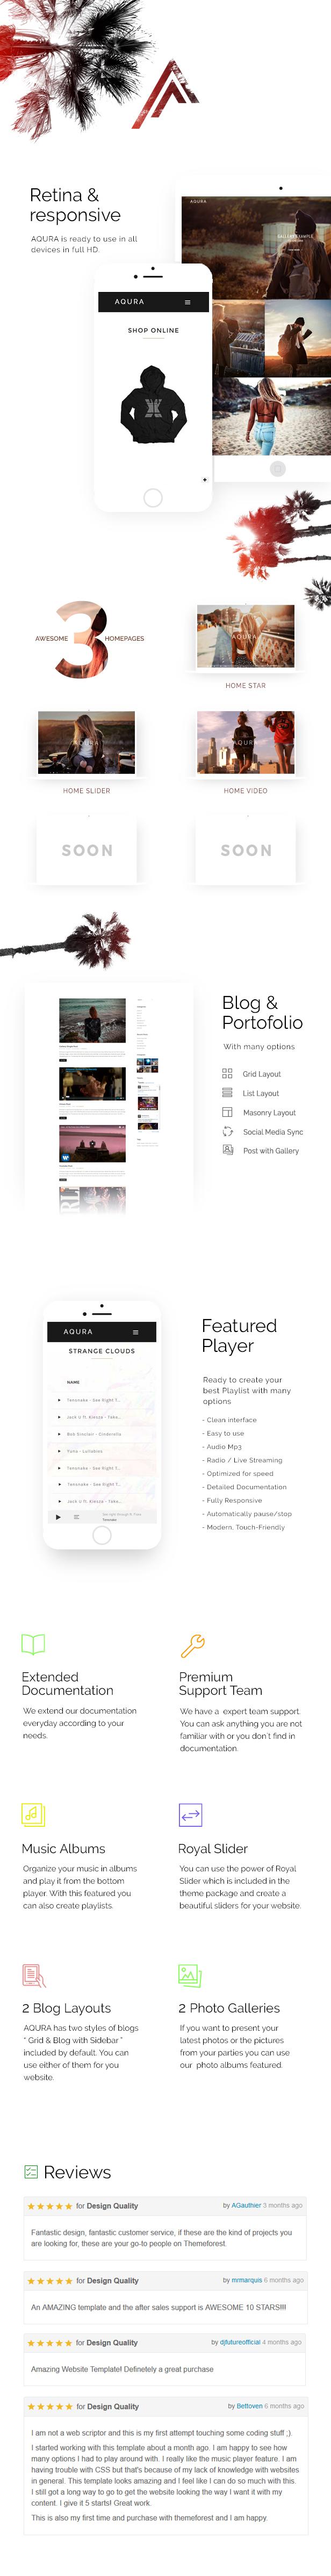 AQURA - Music Band Musicians & DJ's HTML Template - 1